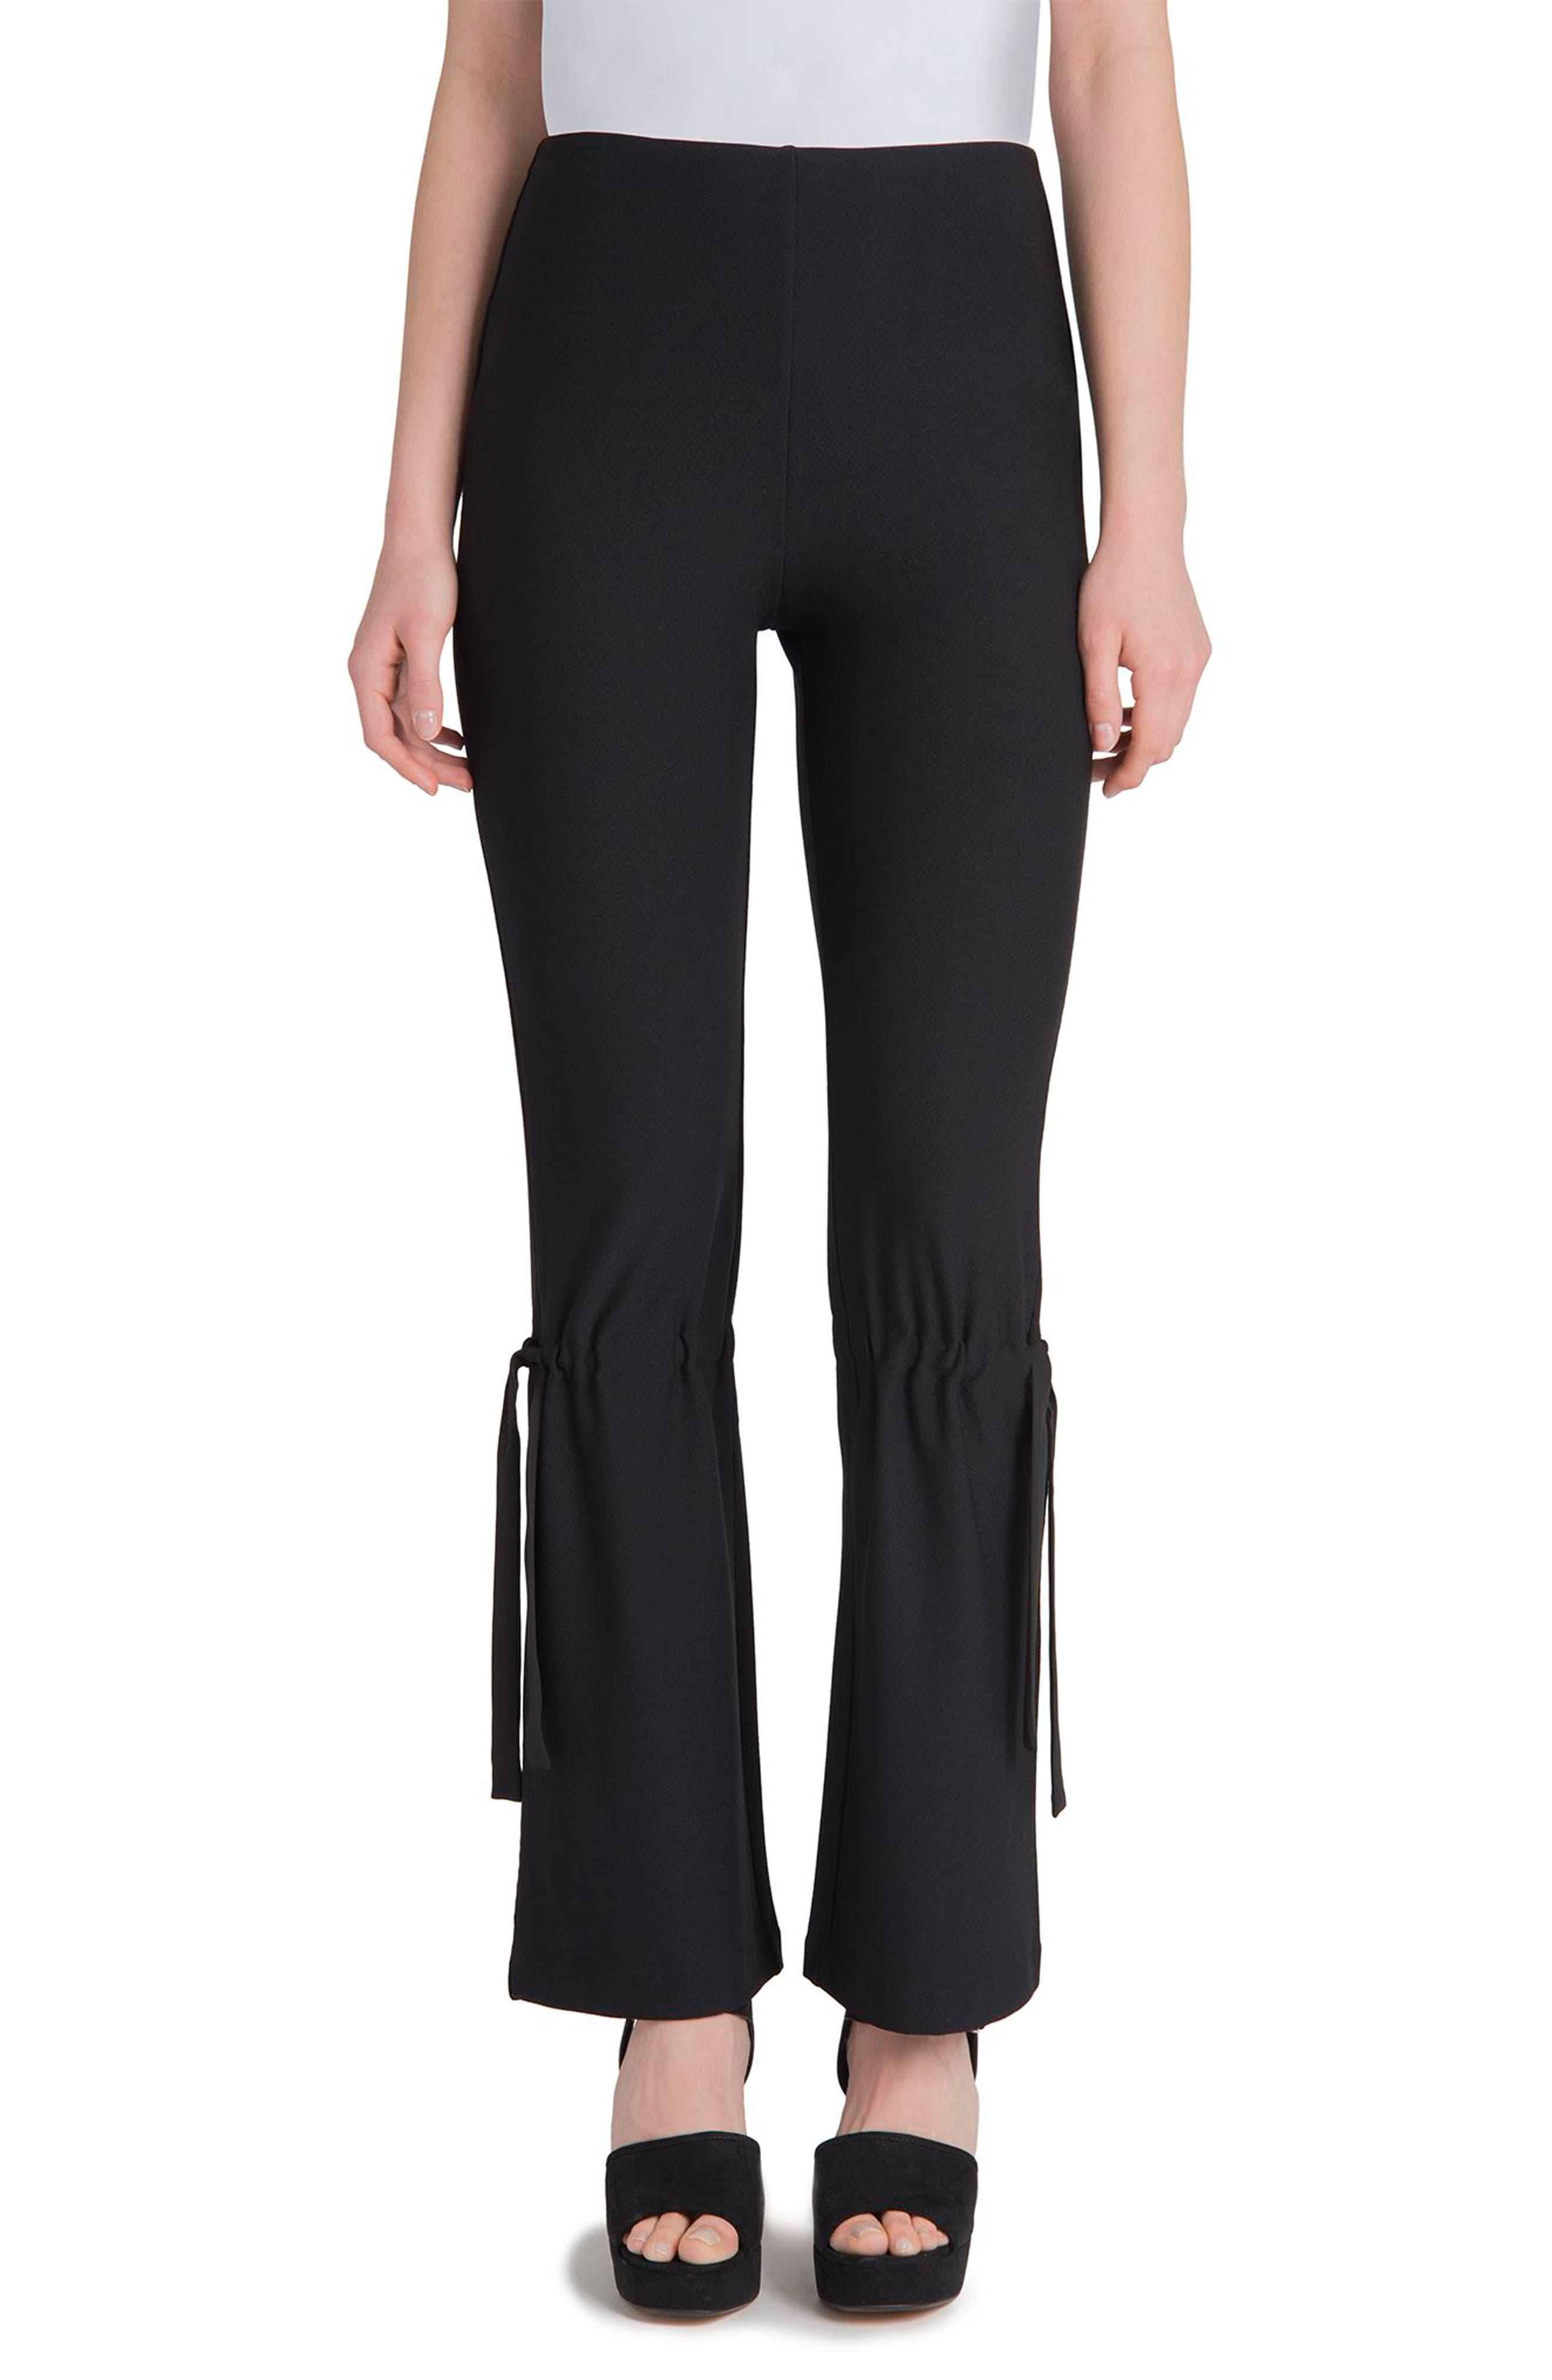 Arcadia High Waist Pants,                         Main,                         color, Black